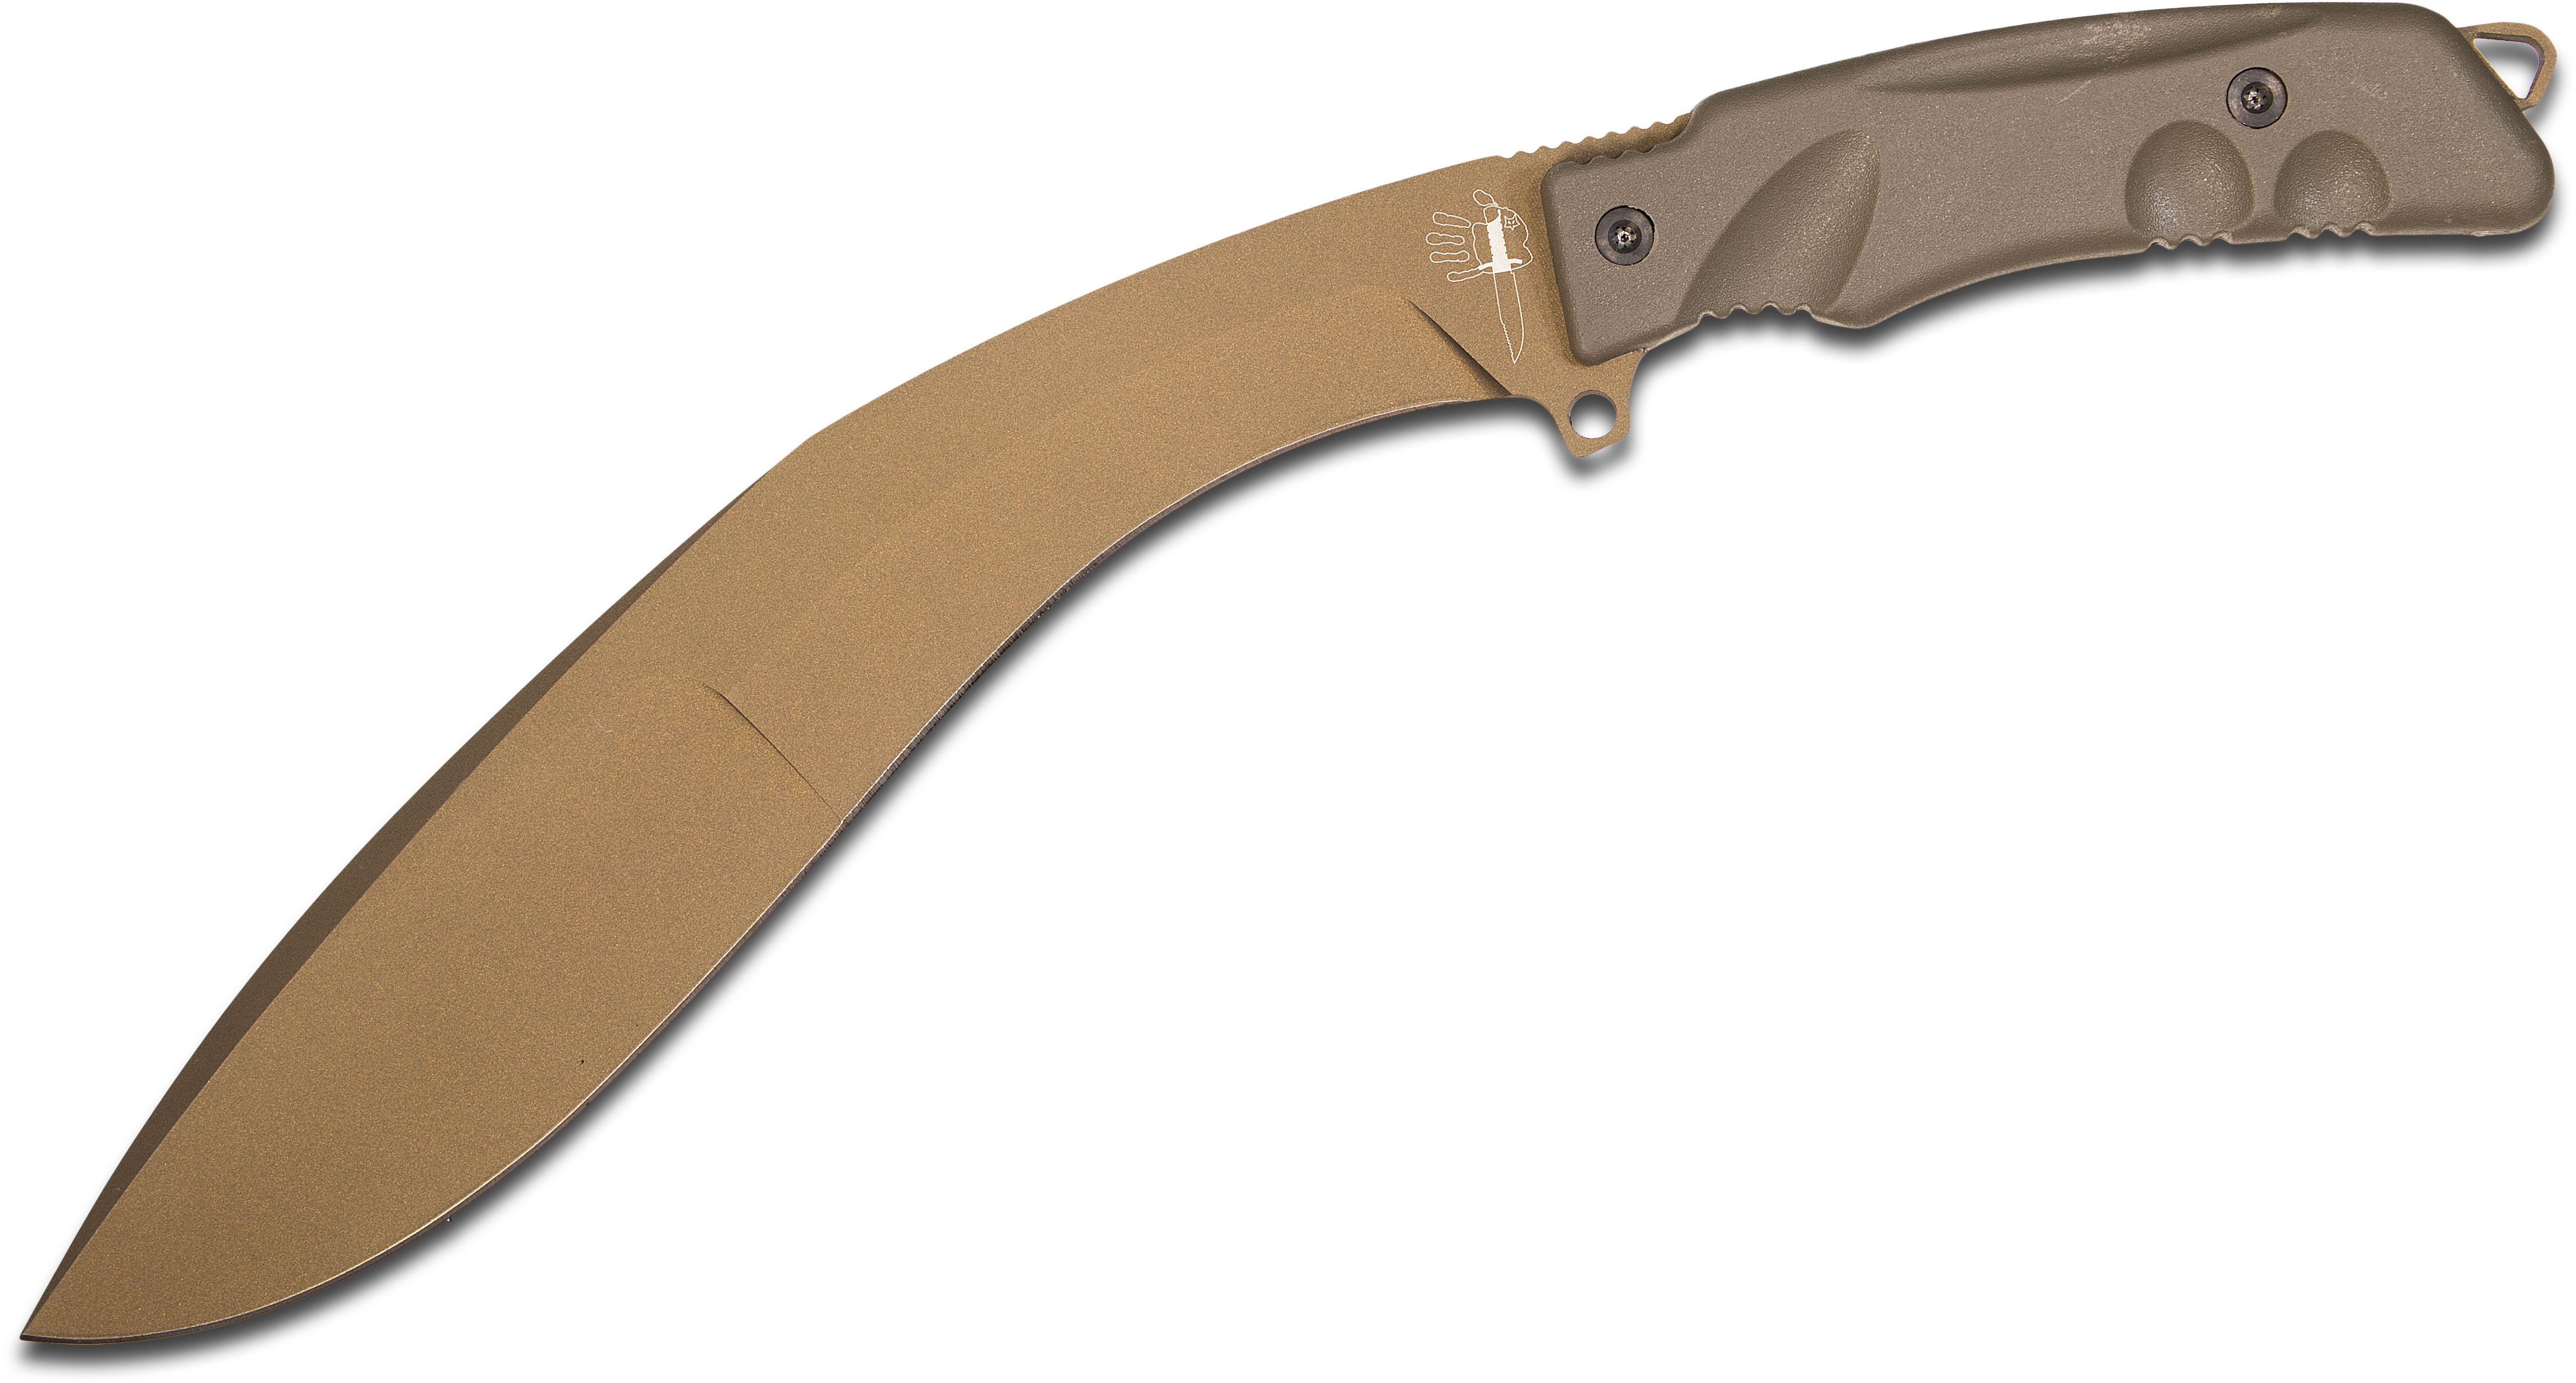 Fox Extreme Tactical Kukri Machete 9 inch N690Co Blade, Bronze Forprene Handles, Nylon Sheath